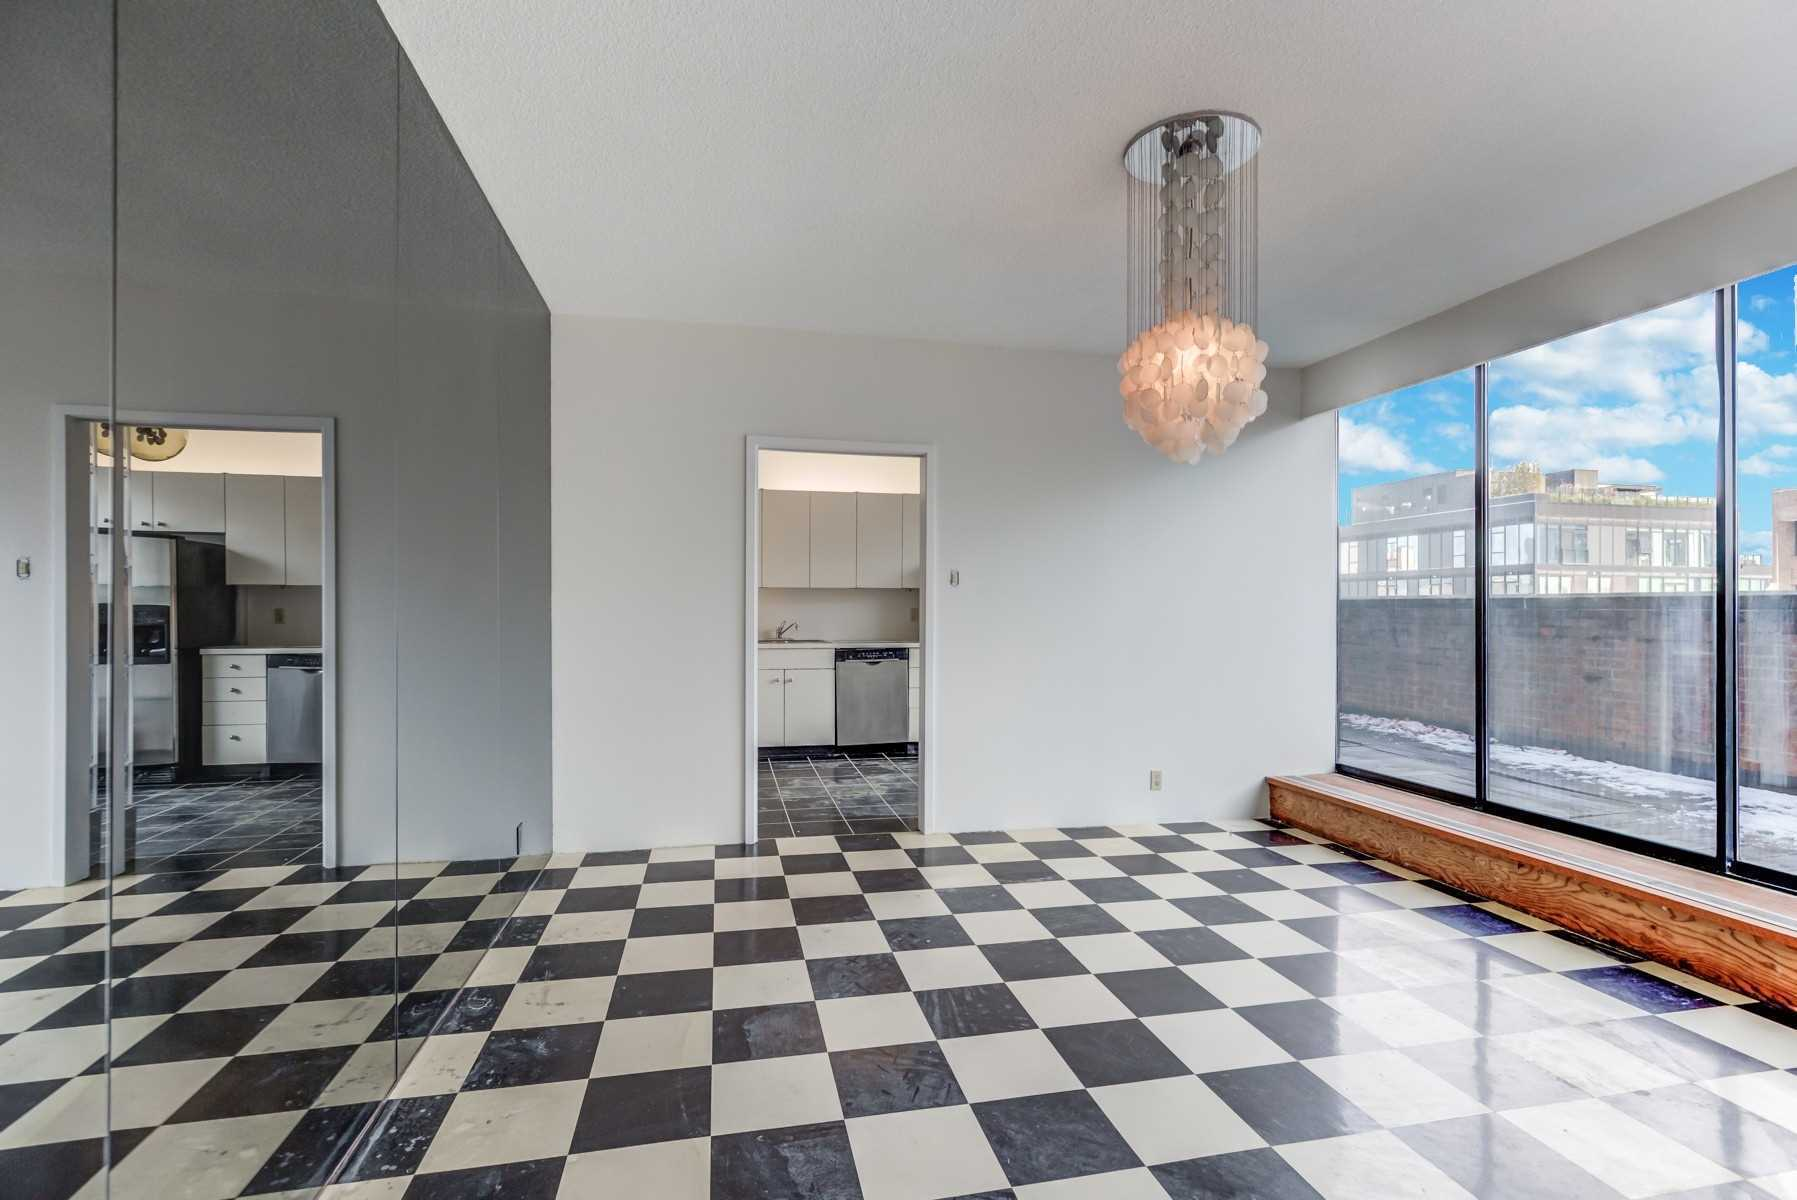 607 - 55A Avenue Rd - Annex Condo Apt for sale, 2 Bedrooms (C5185690) - #17